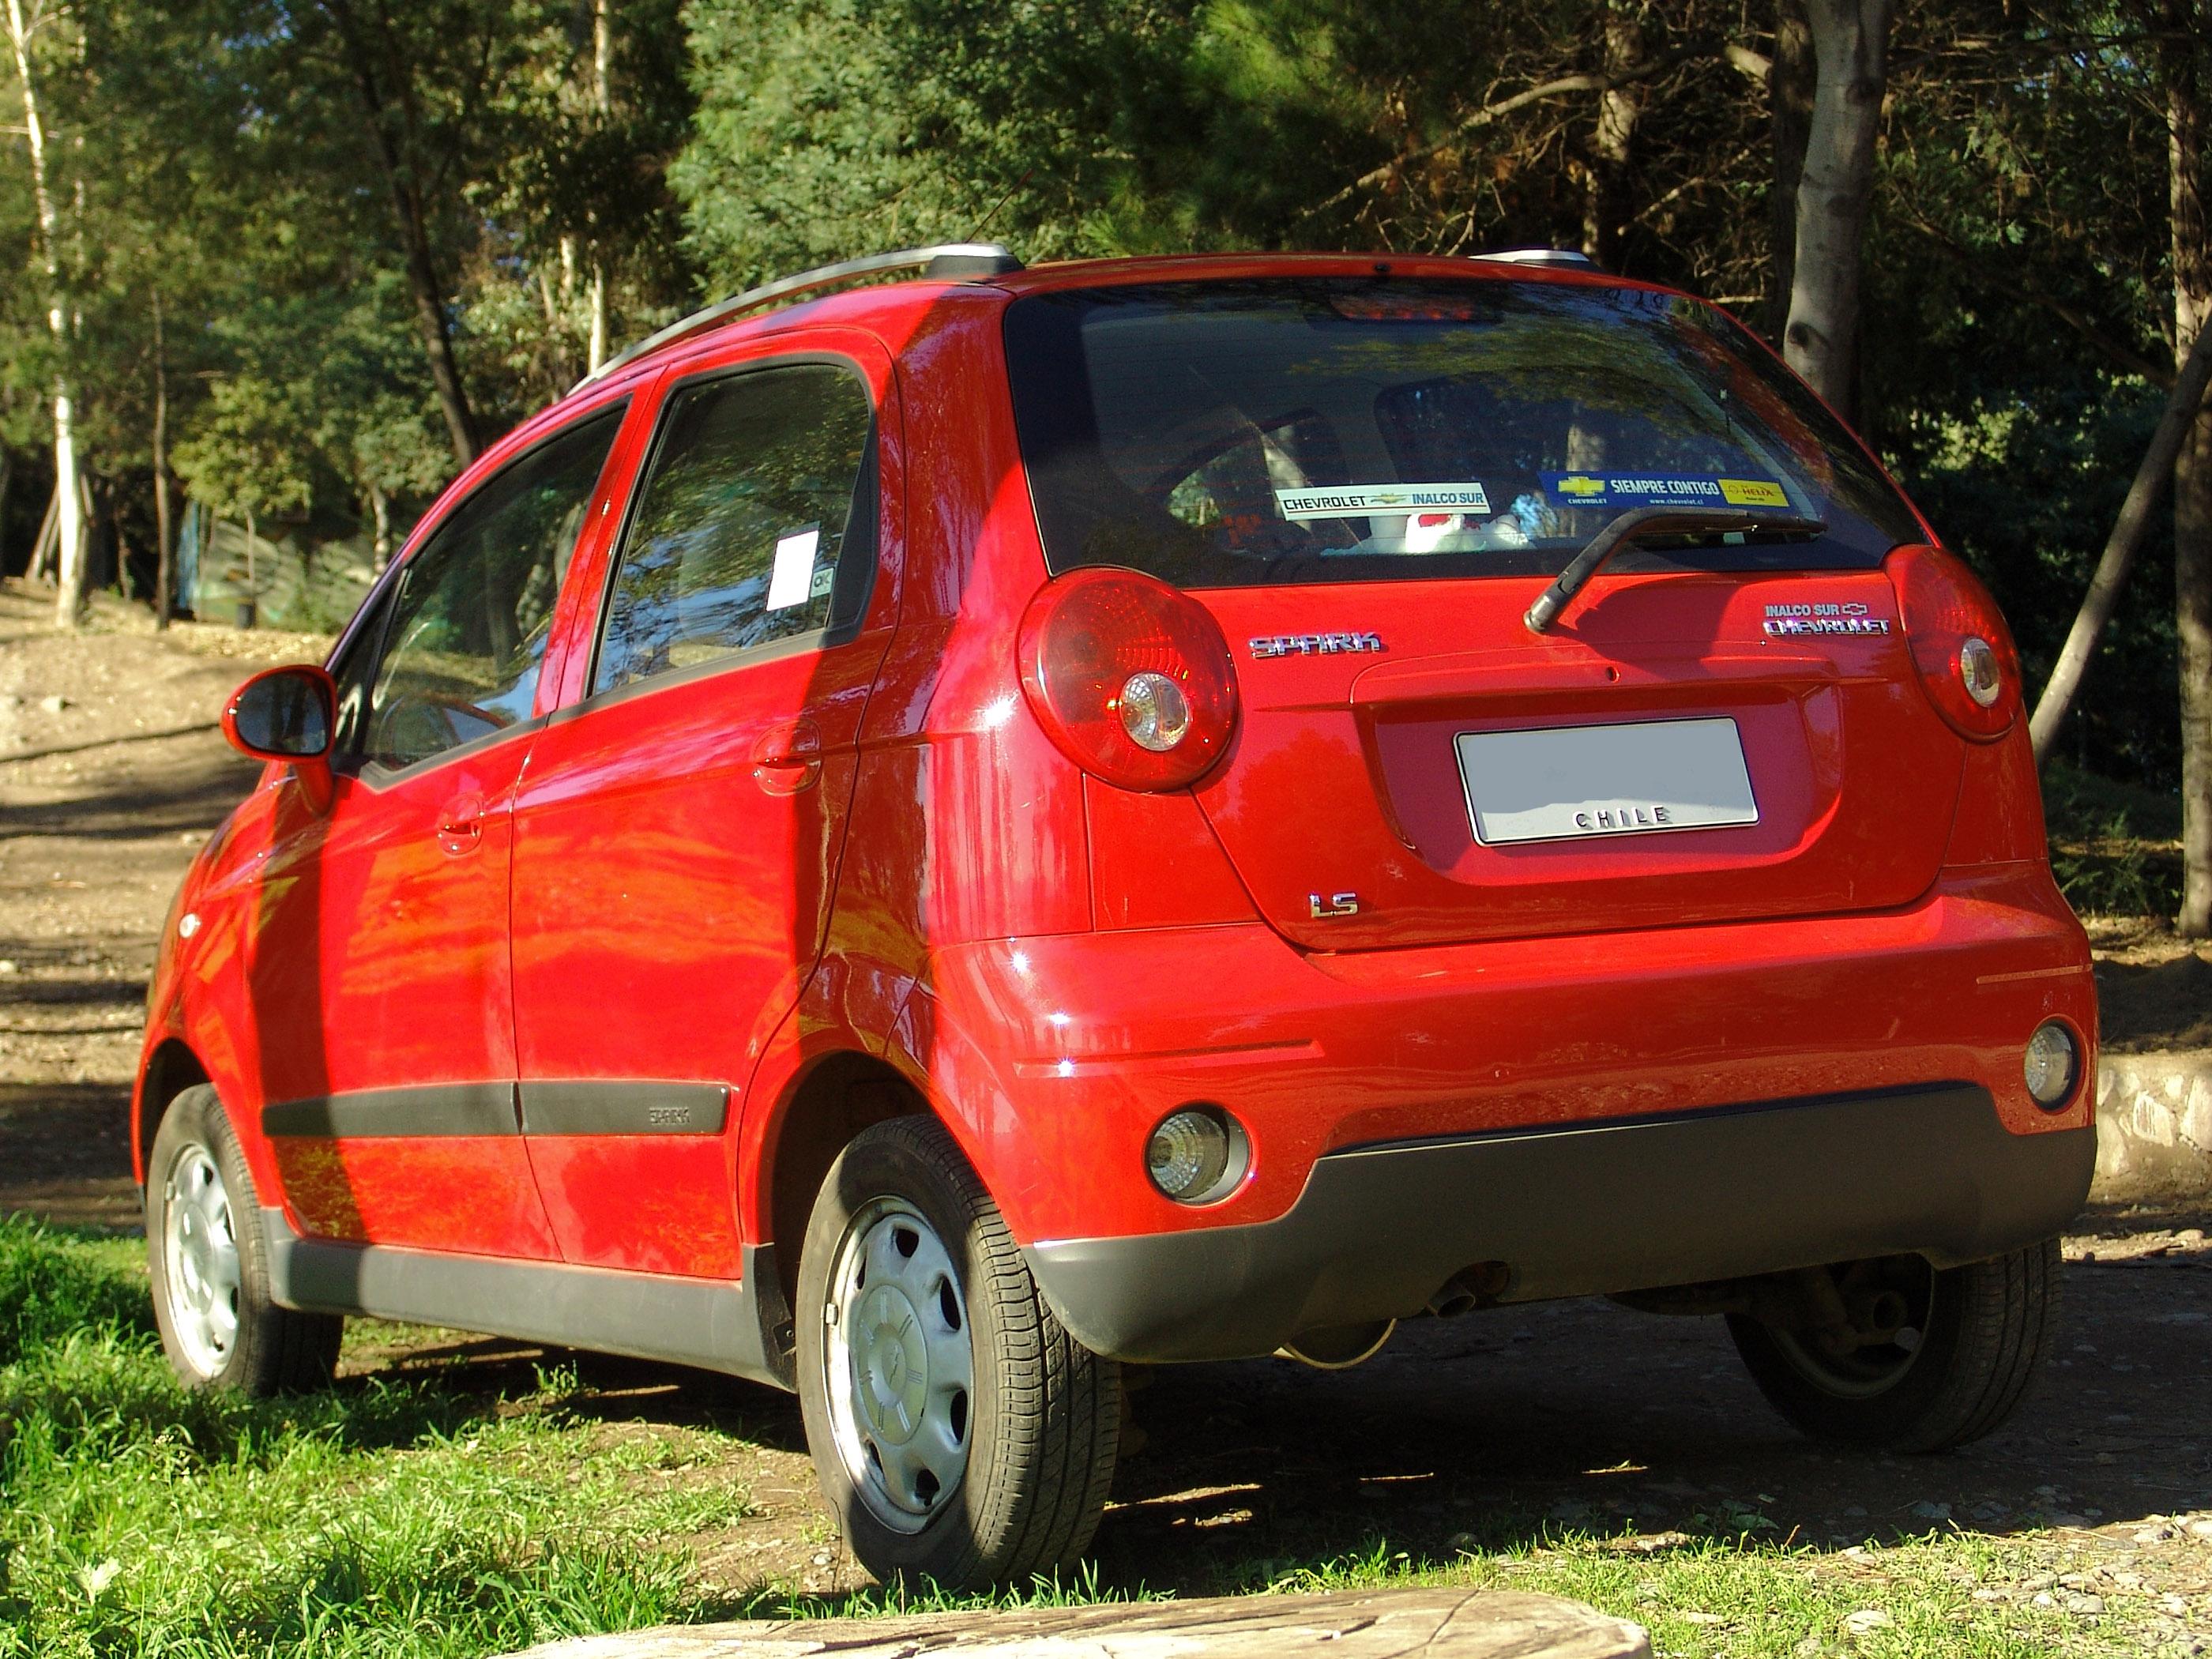 Kelebihan Chevrolet Spark 1.0 Tangguh